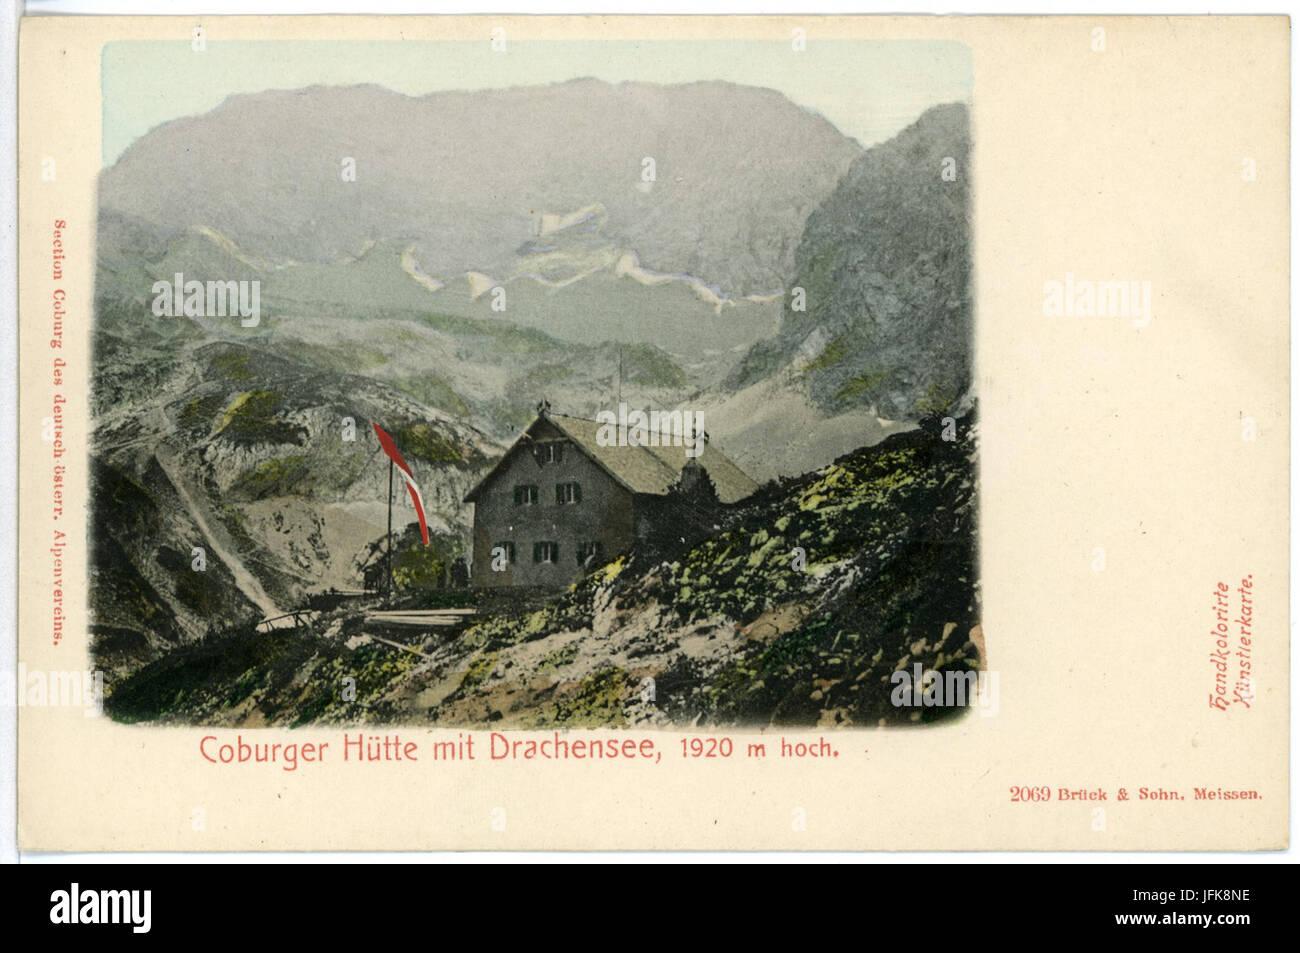 Klettersteig Coburger Hütte : Coburger hütte stockfotos bilder alamy